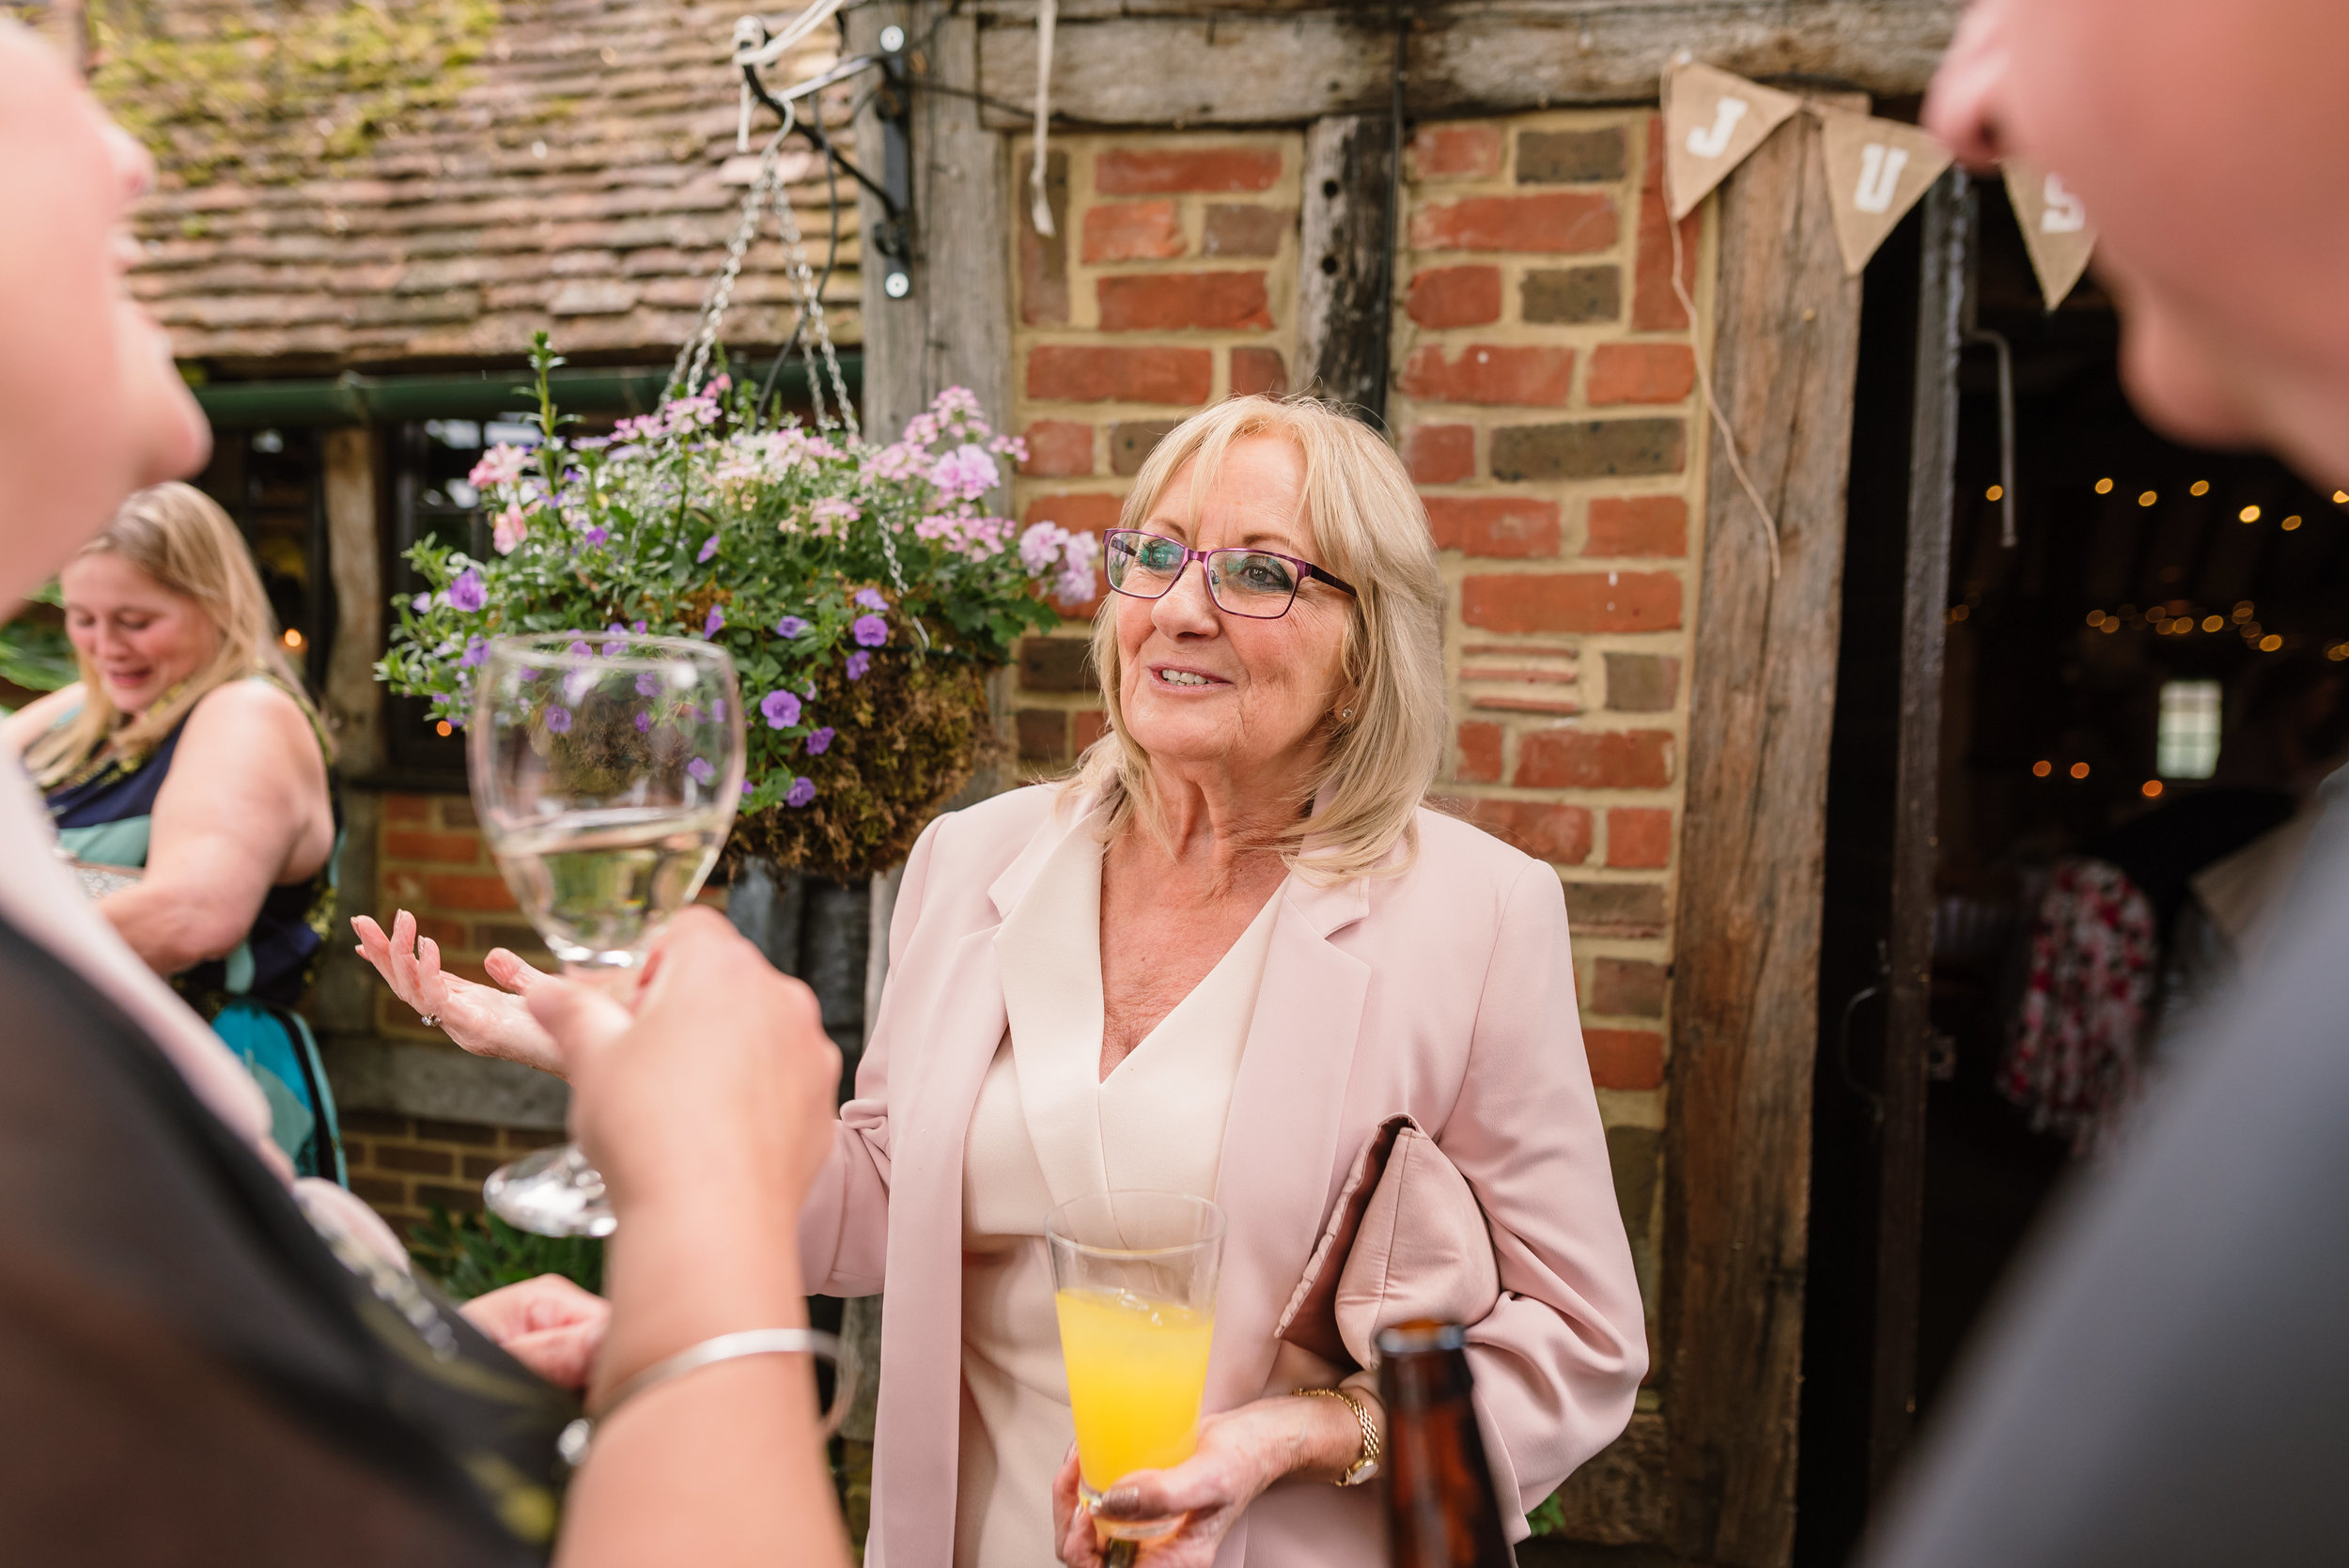 Sarah-Fishlock-Photography : Hampshire-wedding-photographer-hampshire : fleet-wedding-photographer-fleet : Meade-Hall-Wedding-Photographer : Meade-Hall-Wedding-Photos-679.jpg